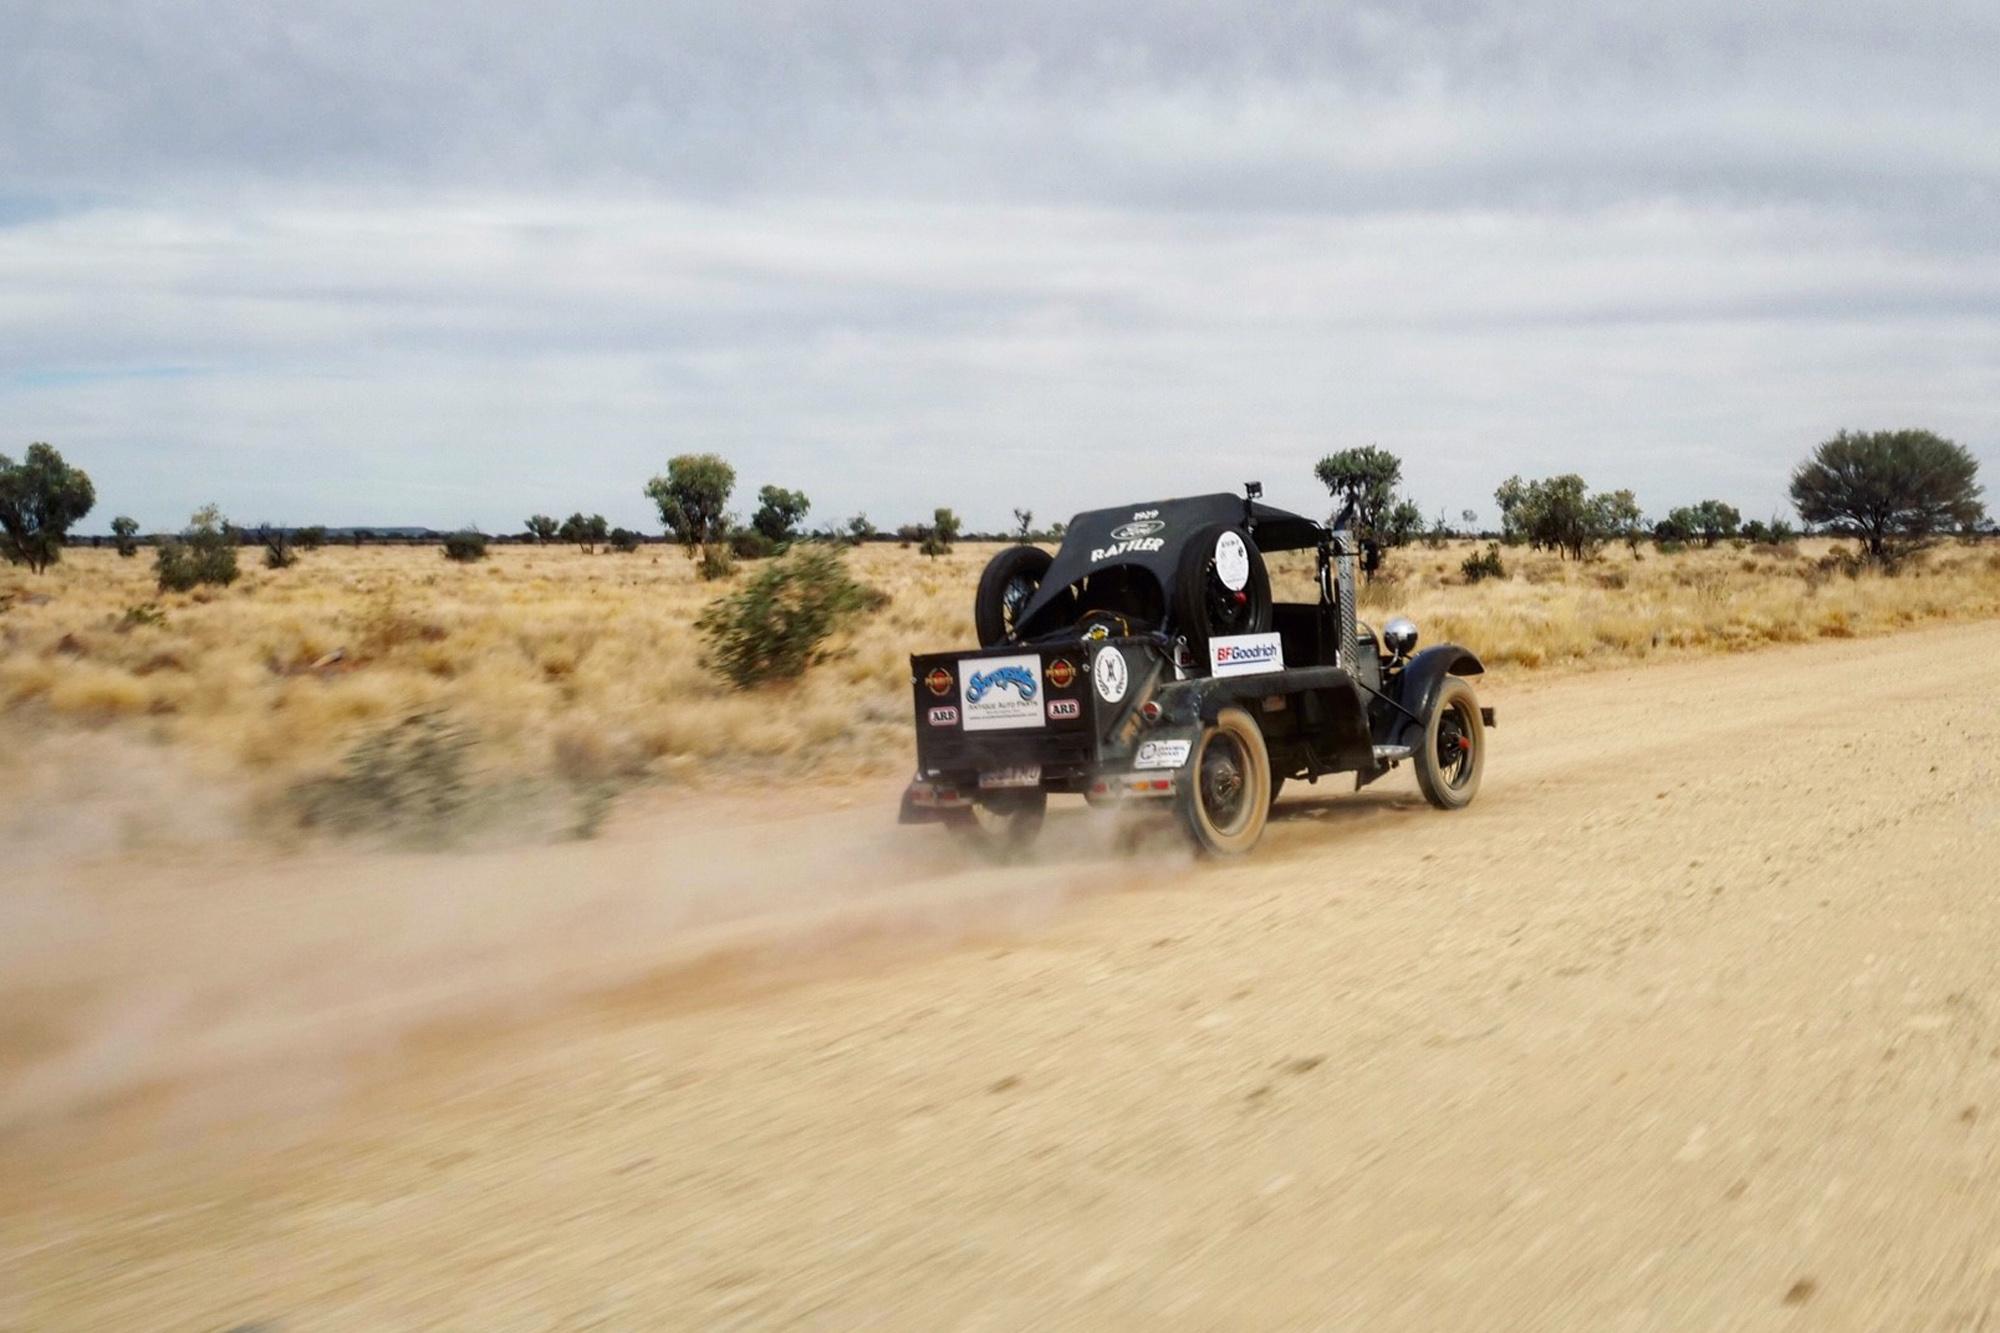 Vehicle speeding along dirt road in Australia